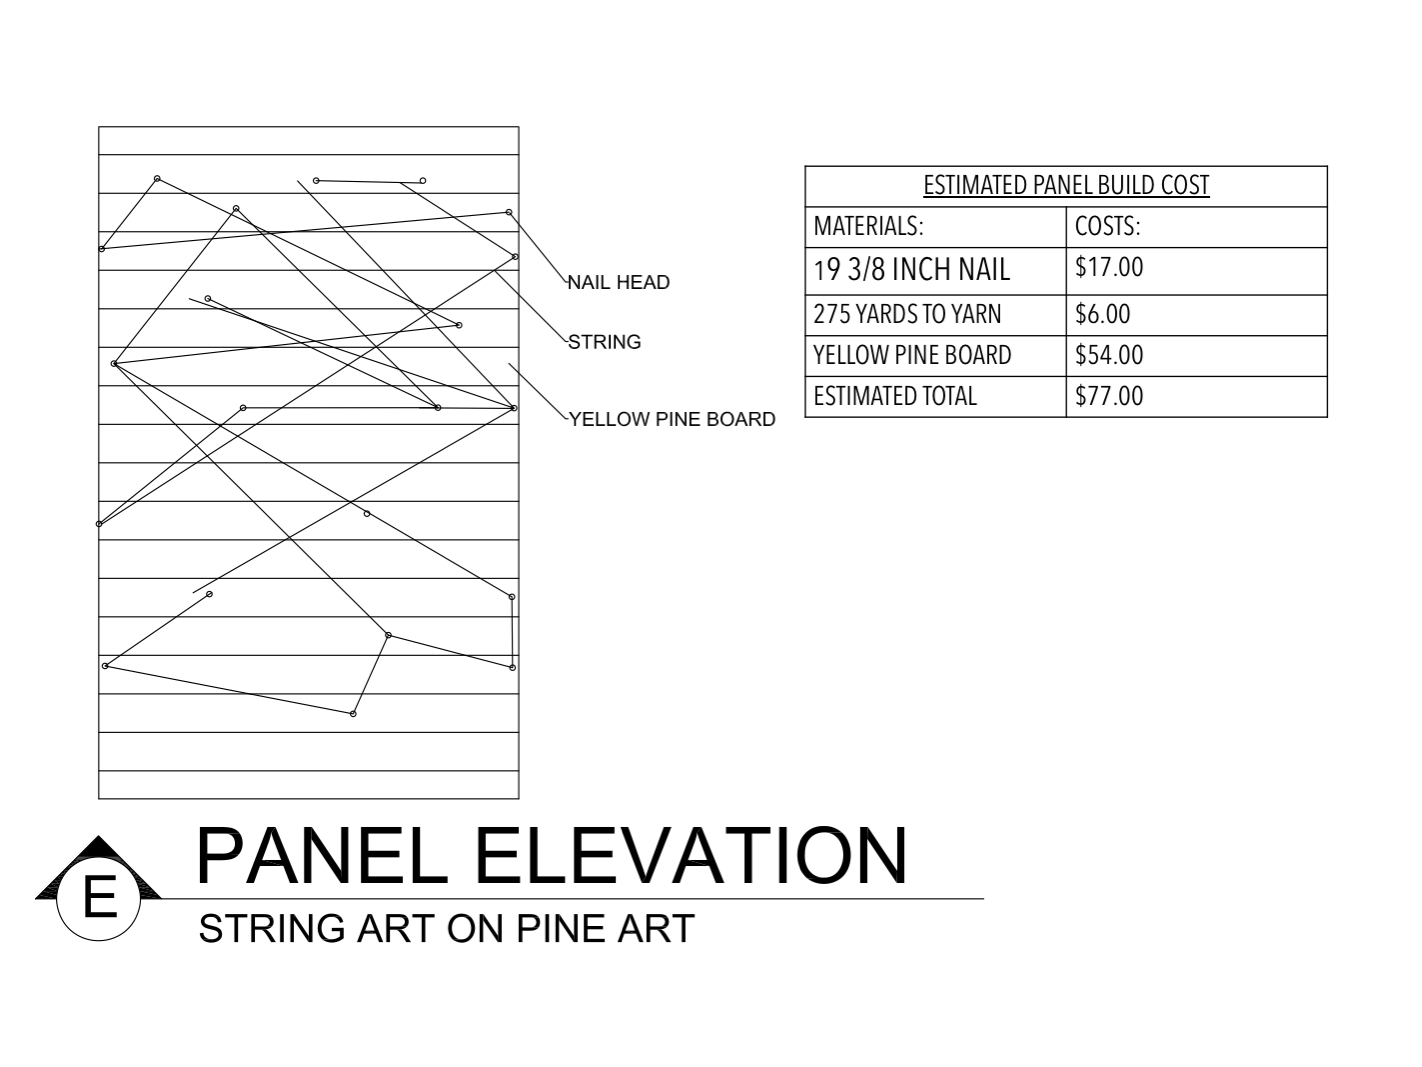 Panel Elevation E